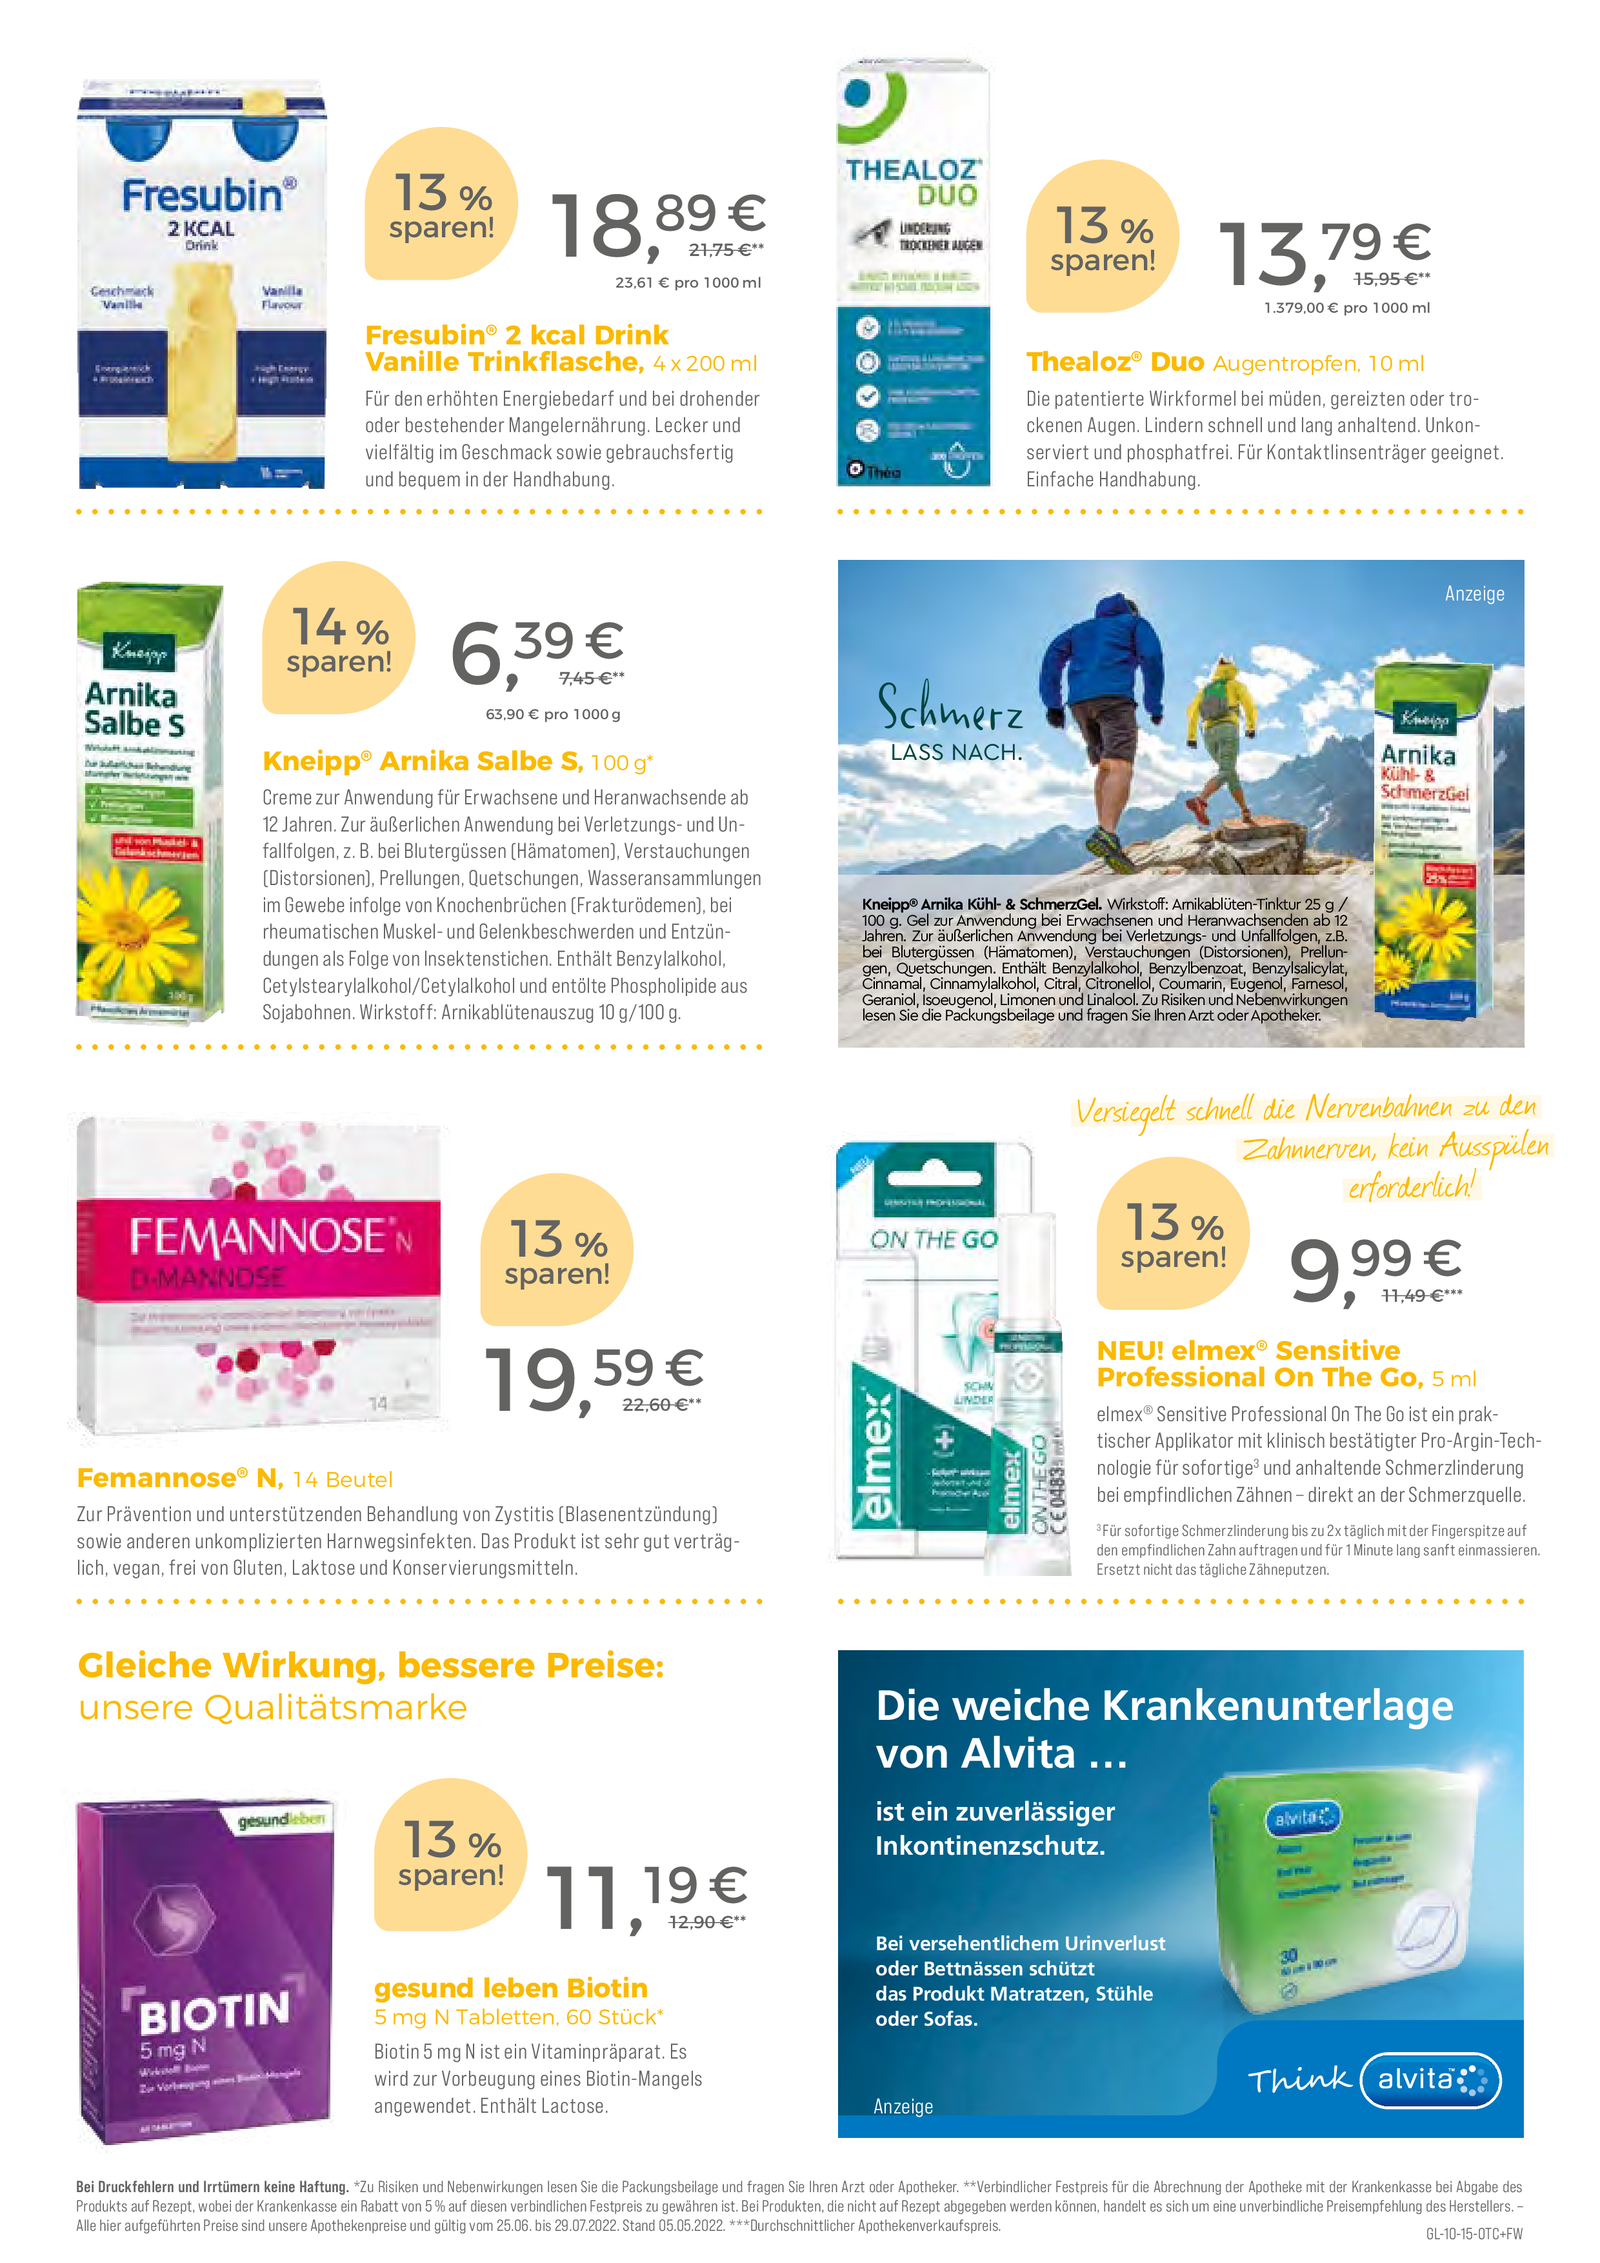 https://mein-uploads.apocdn.net/13294/leaflets/gesundleben_niedrig-Seite3.png